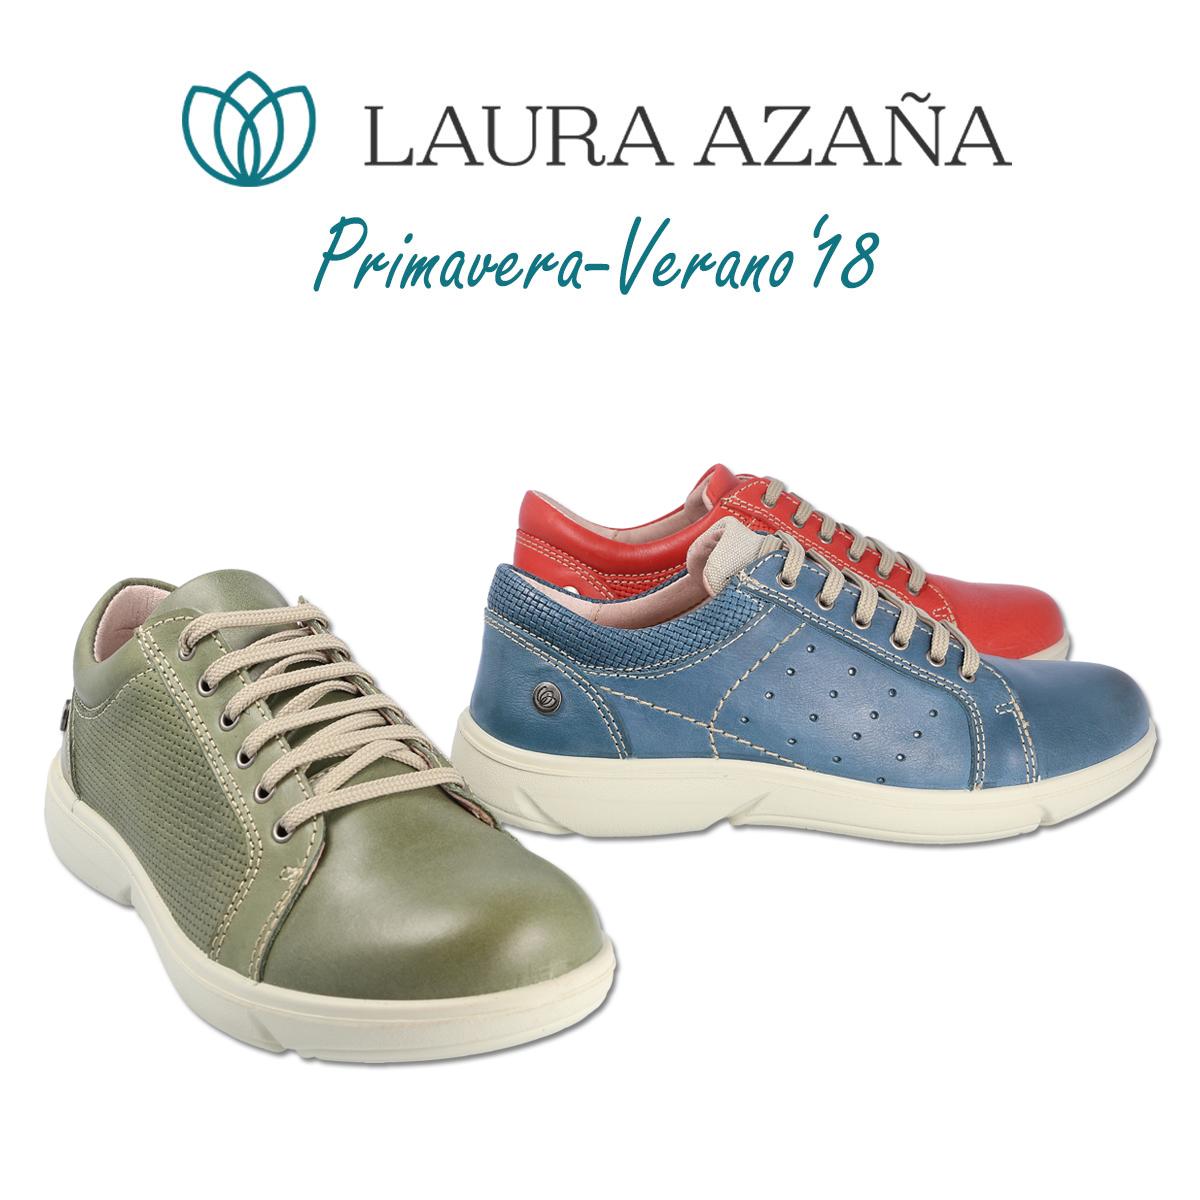 839e2c94ed4 Zapatos sport para mujer con cordones